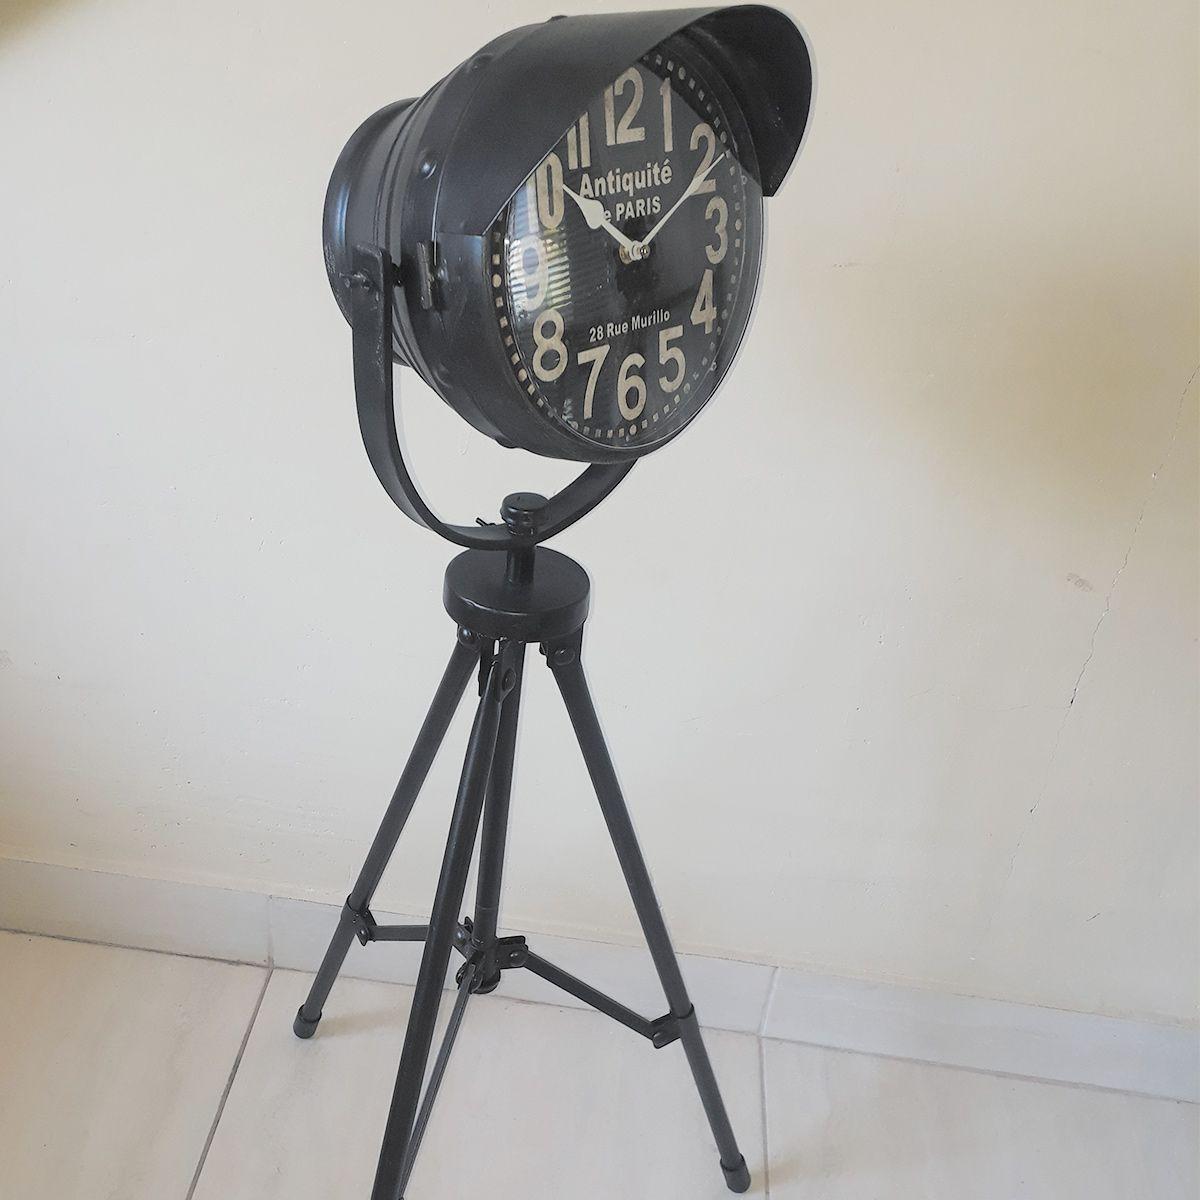 Relógio Tripé de Ferro Antiqueté de Paris 28 Rue Murillo